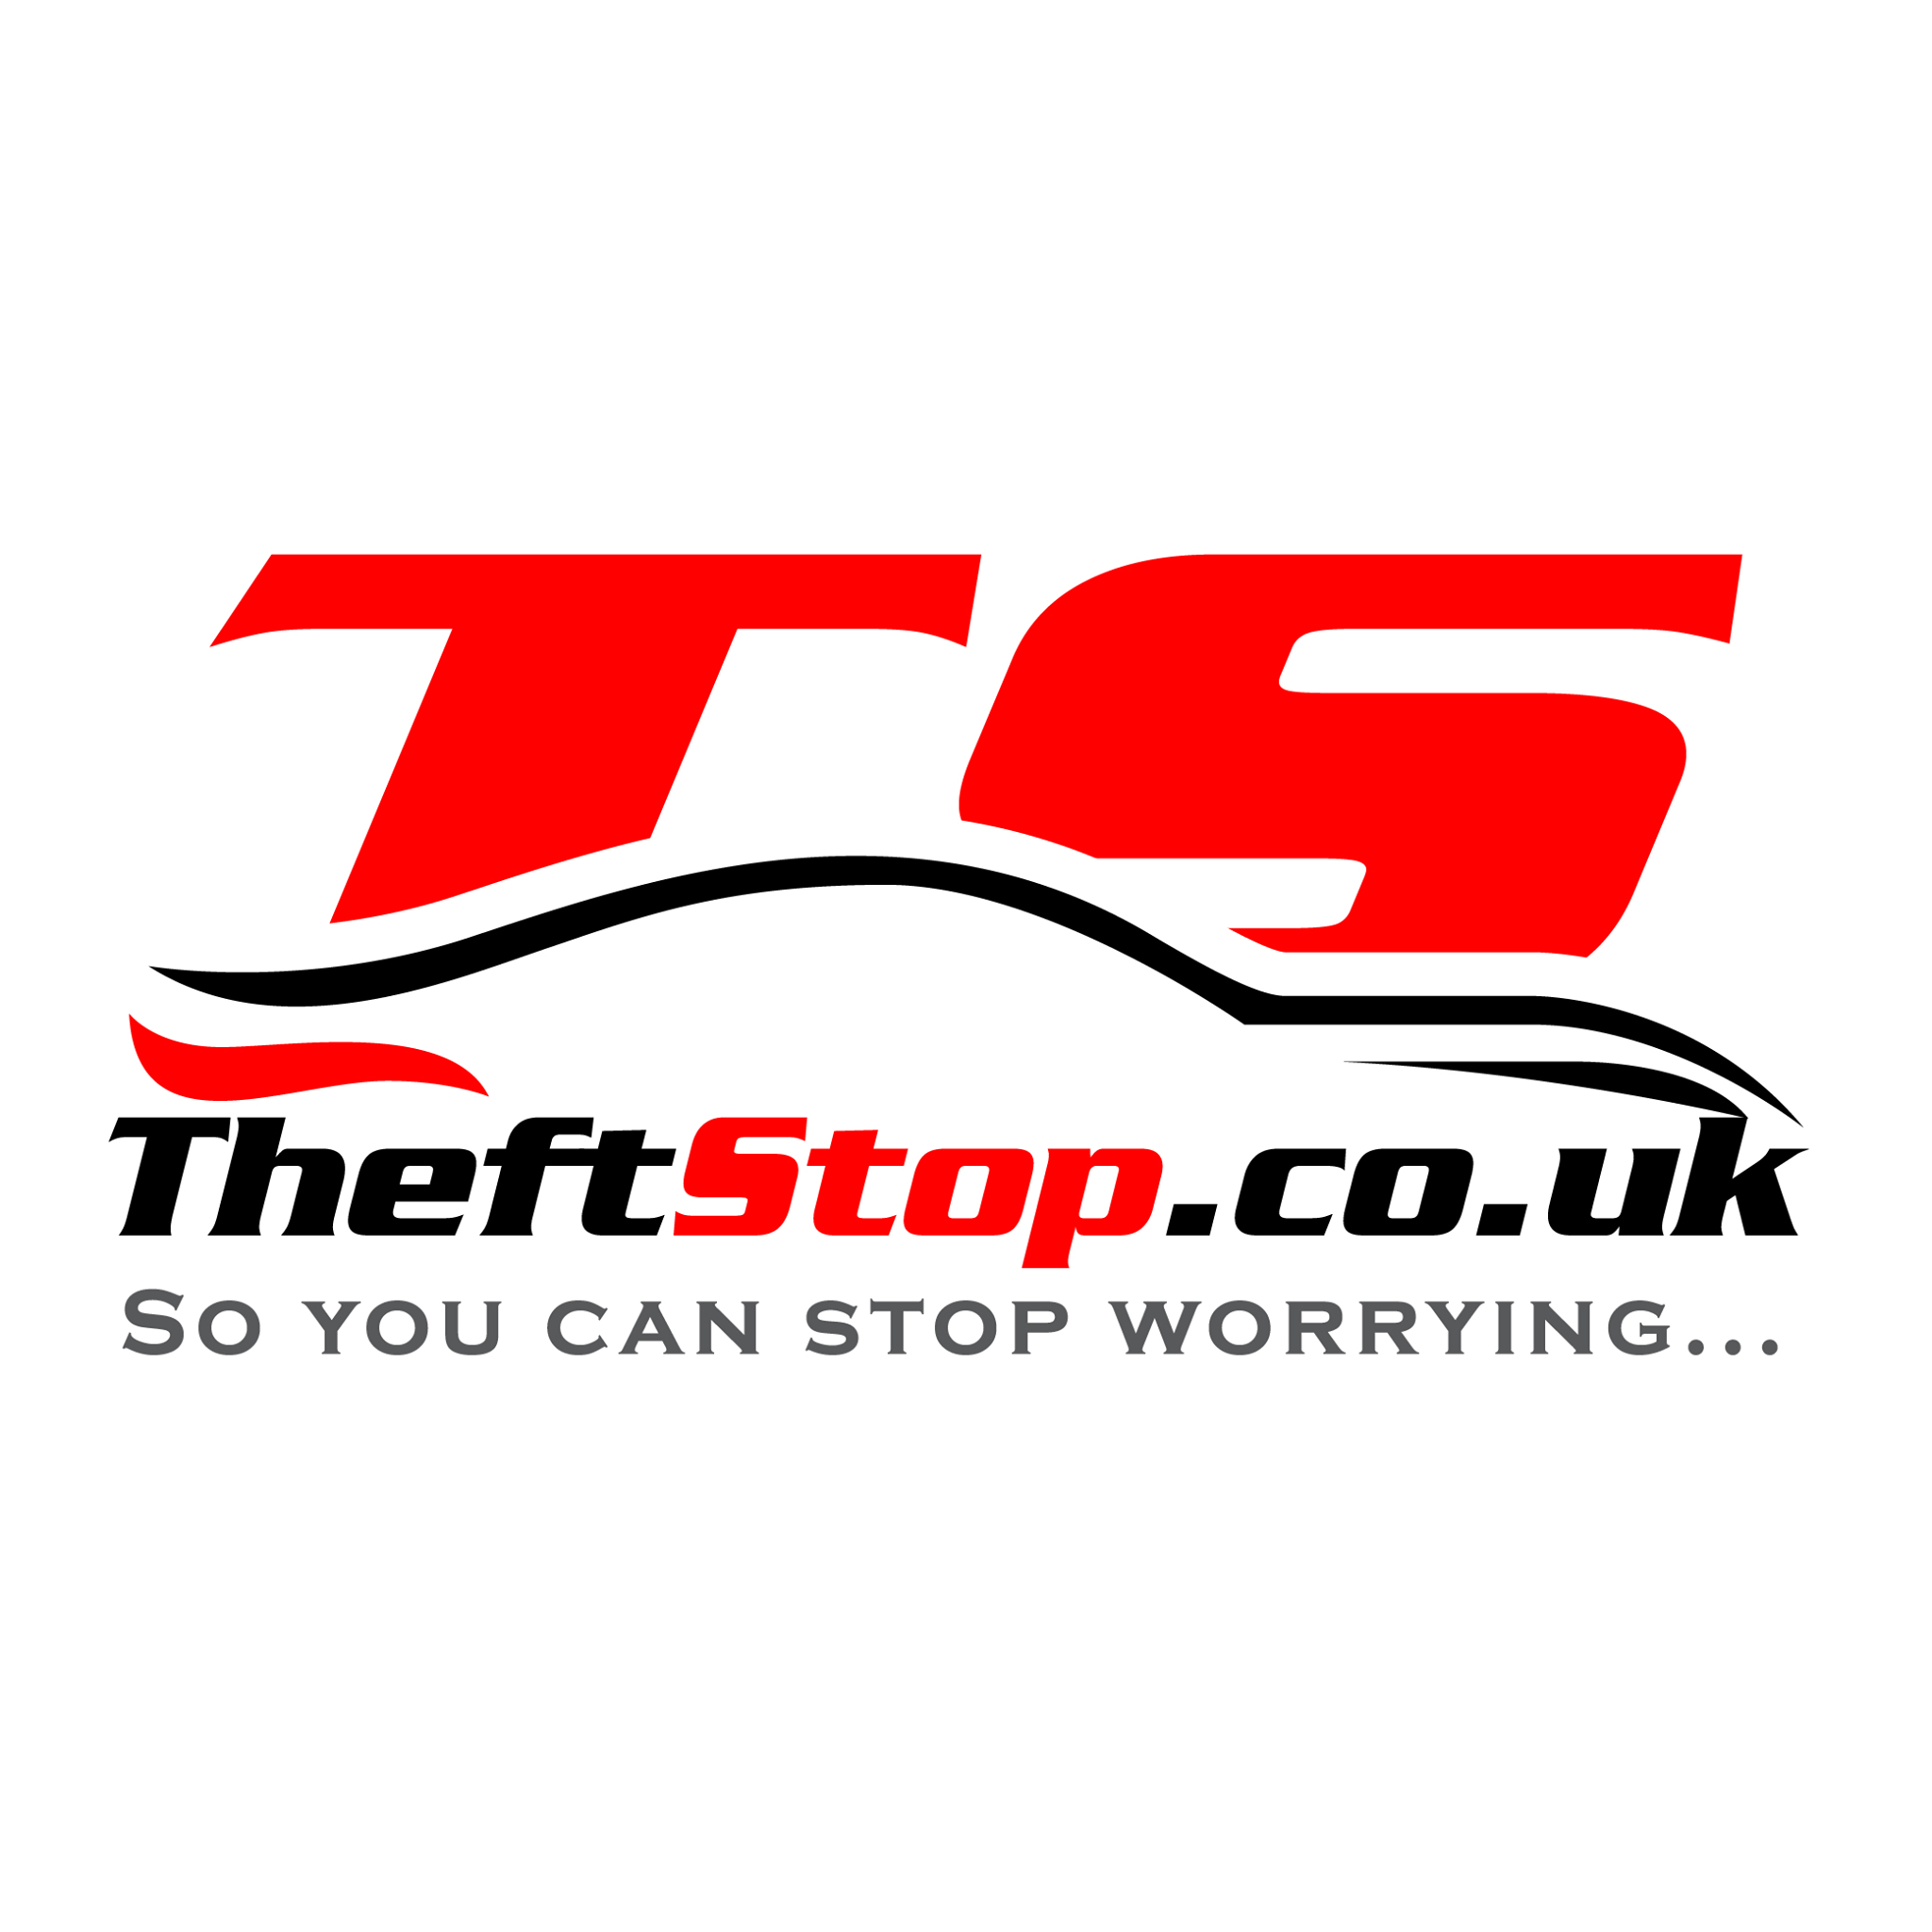 Logo of Theft Stop Car Security In Birmingham, West Midlands